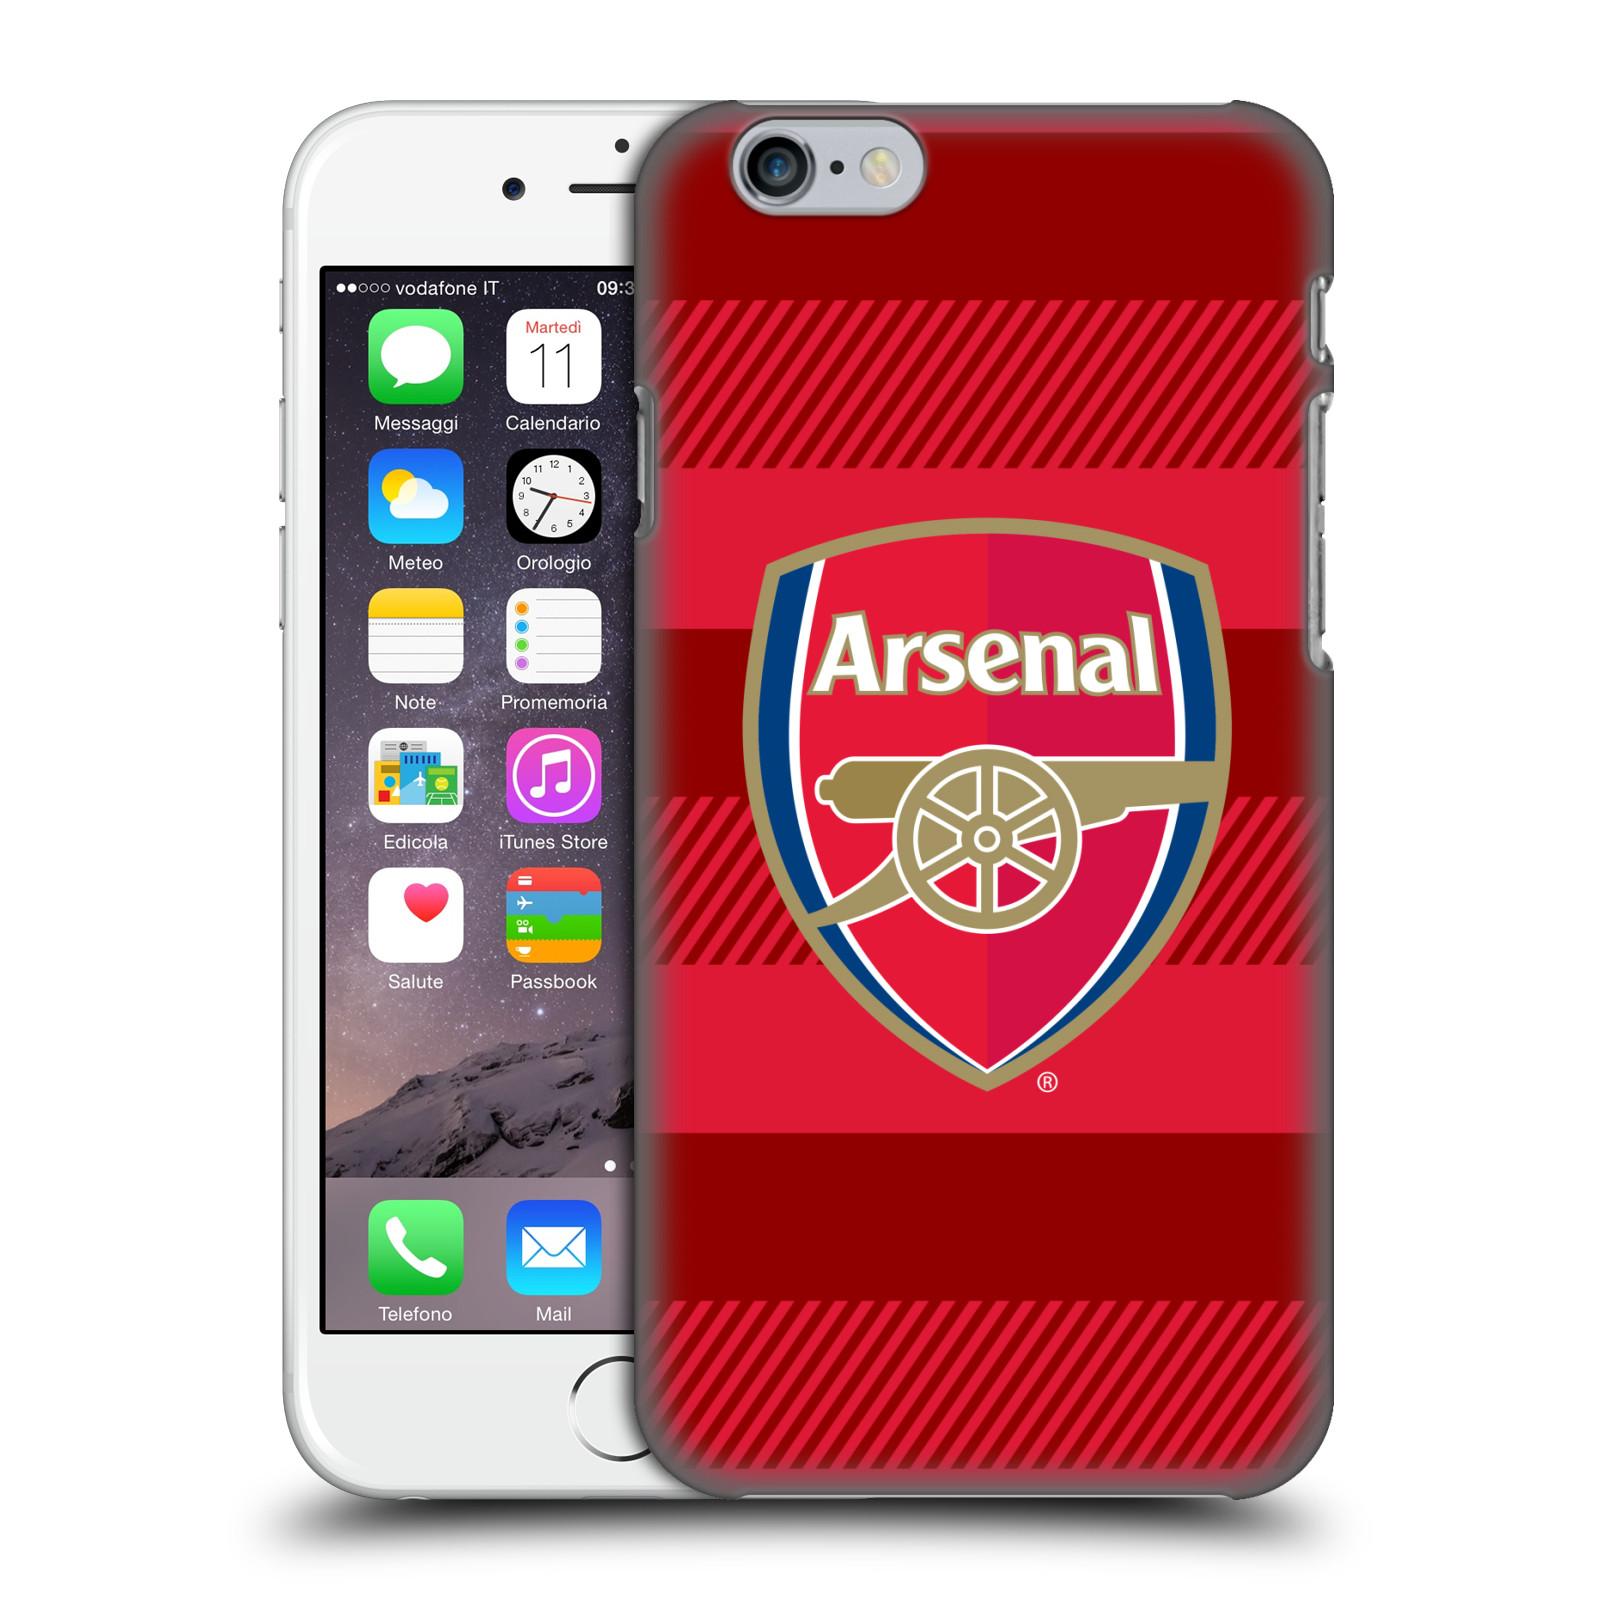 Plastové pouzdro na mobil Apple iPhone 6 - Head Case - Arsenal FC - Logo s pruhy